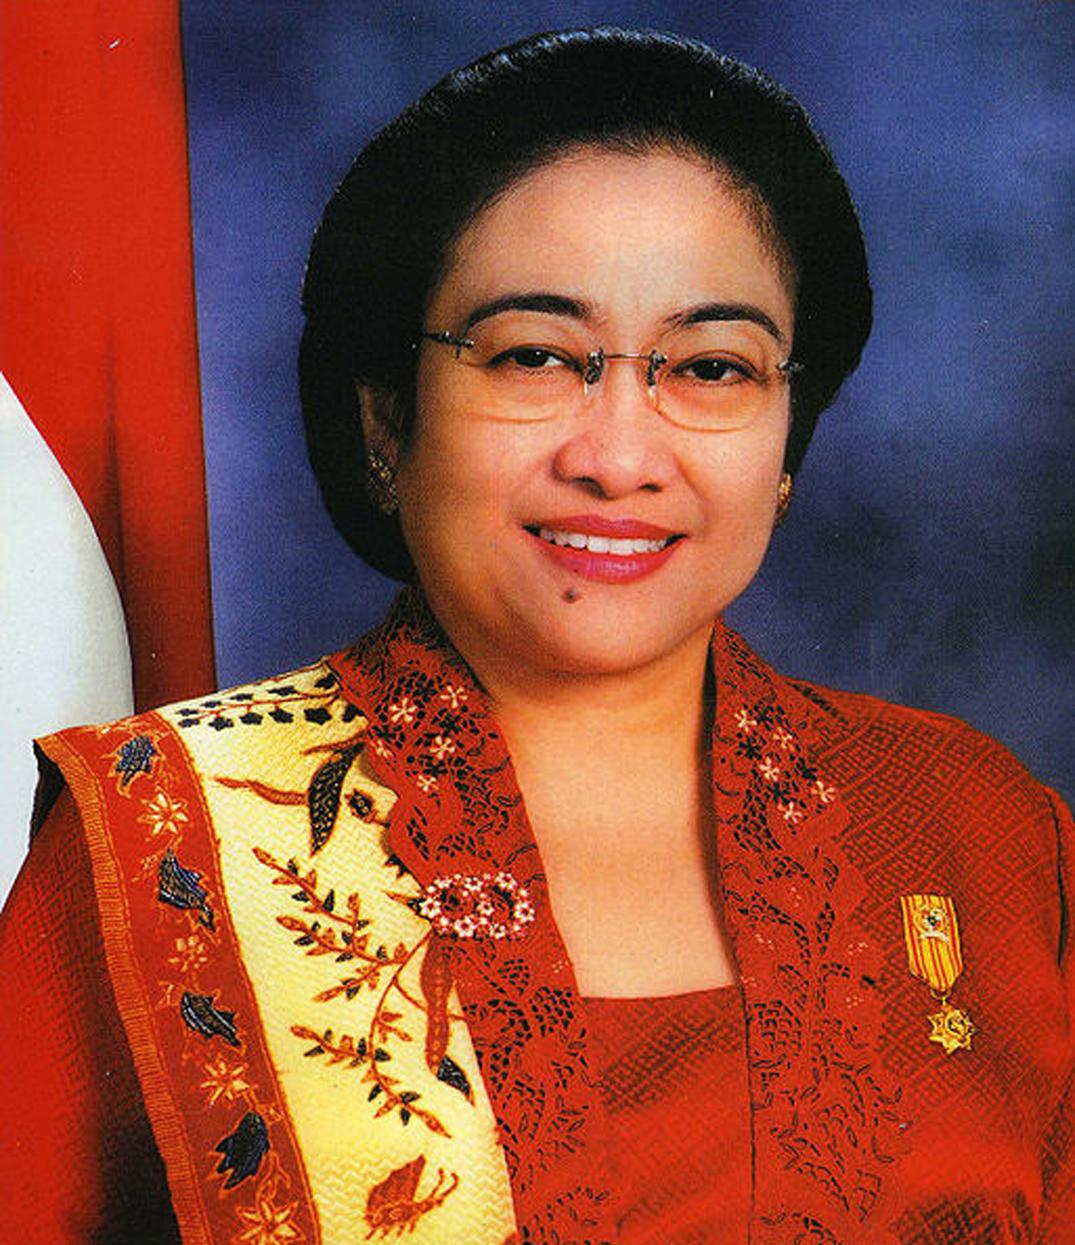 Presiden Megawati Soekarnoputri berwarna